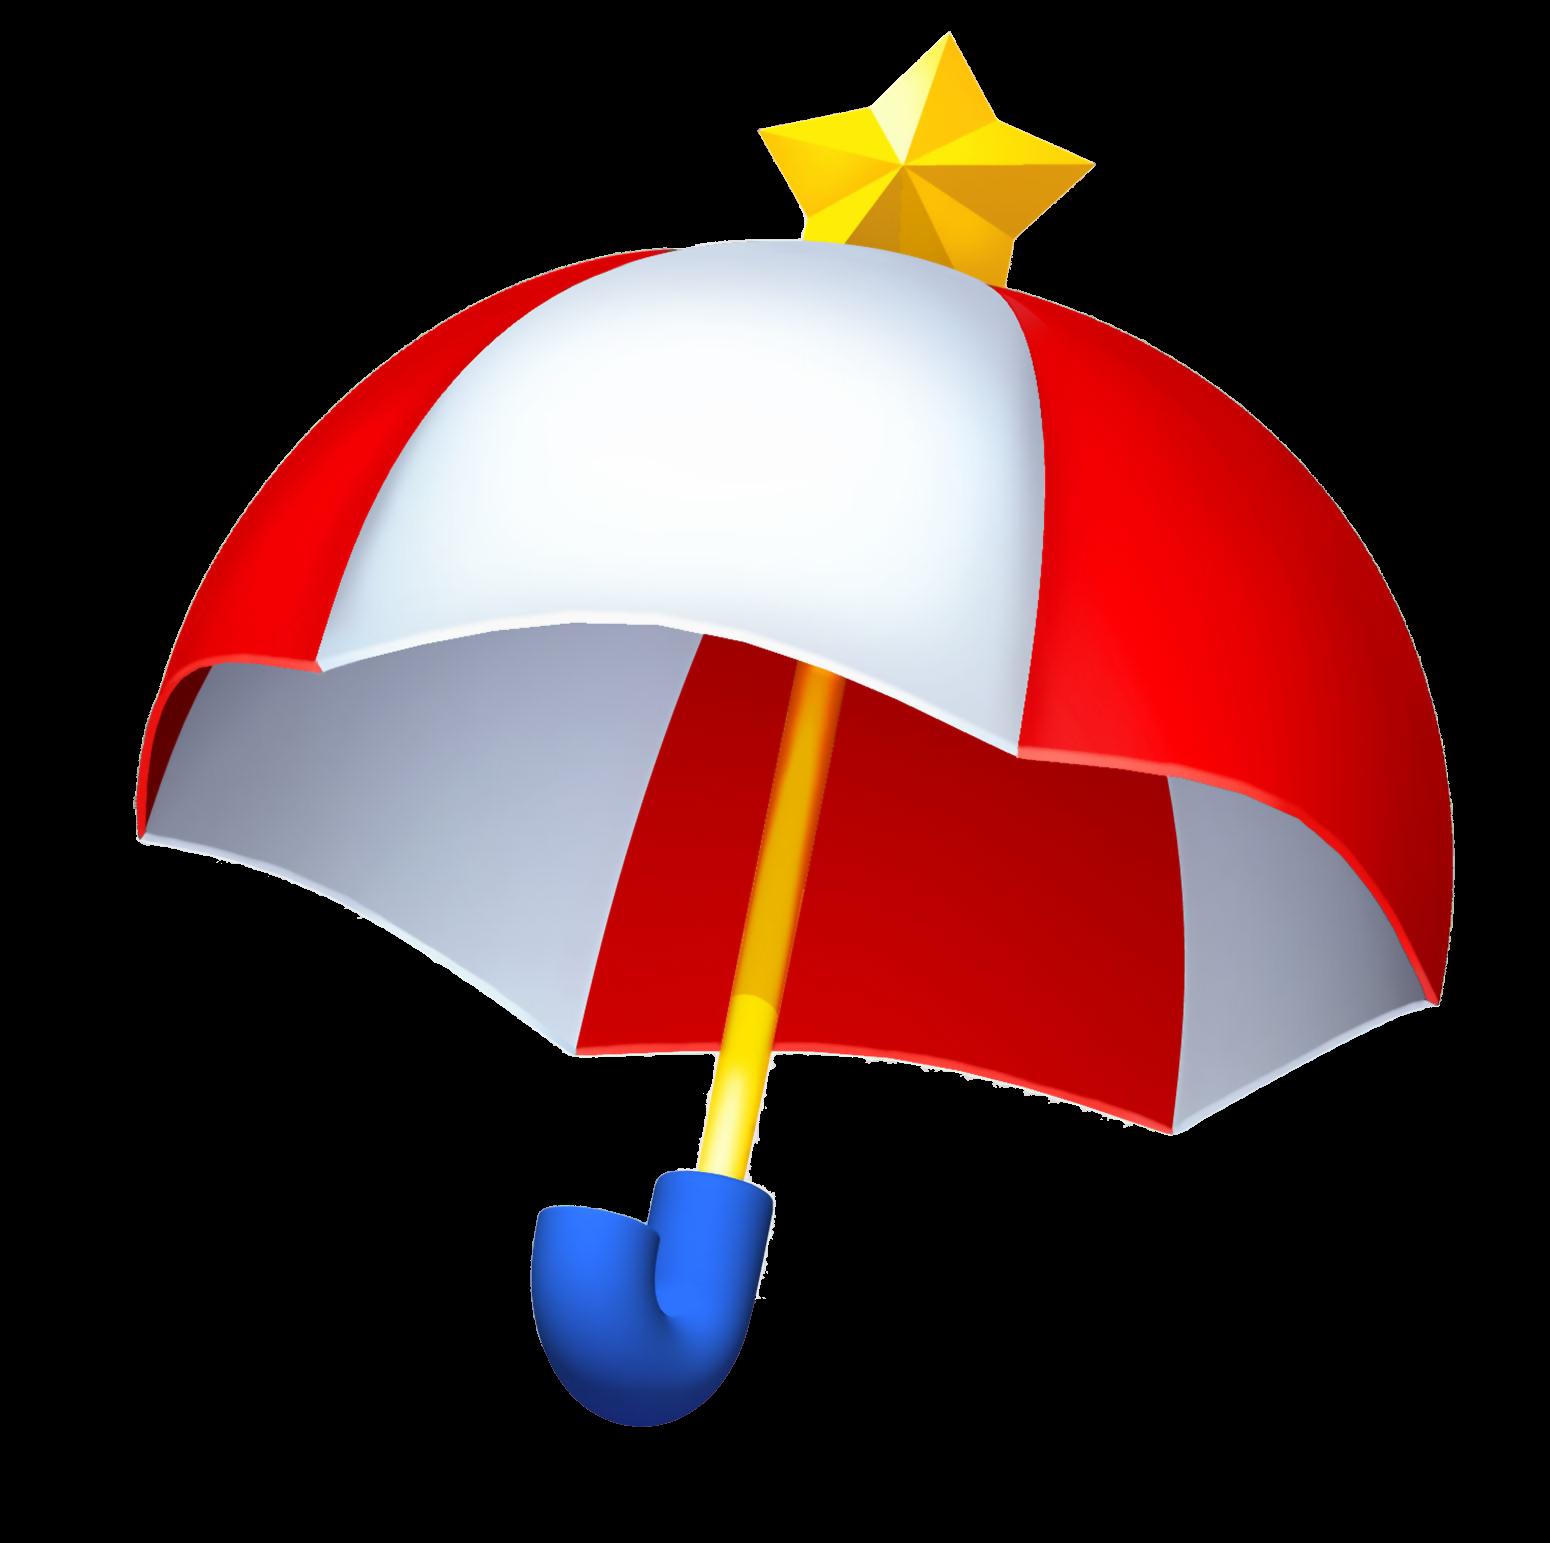 Clipart umbrella striped umbrella. Parasol enemy kirby wiki